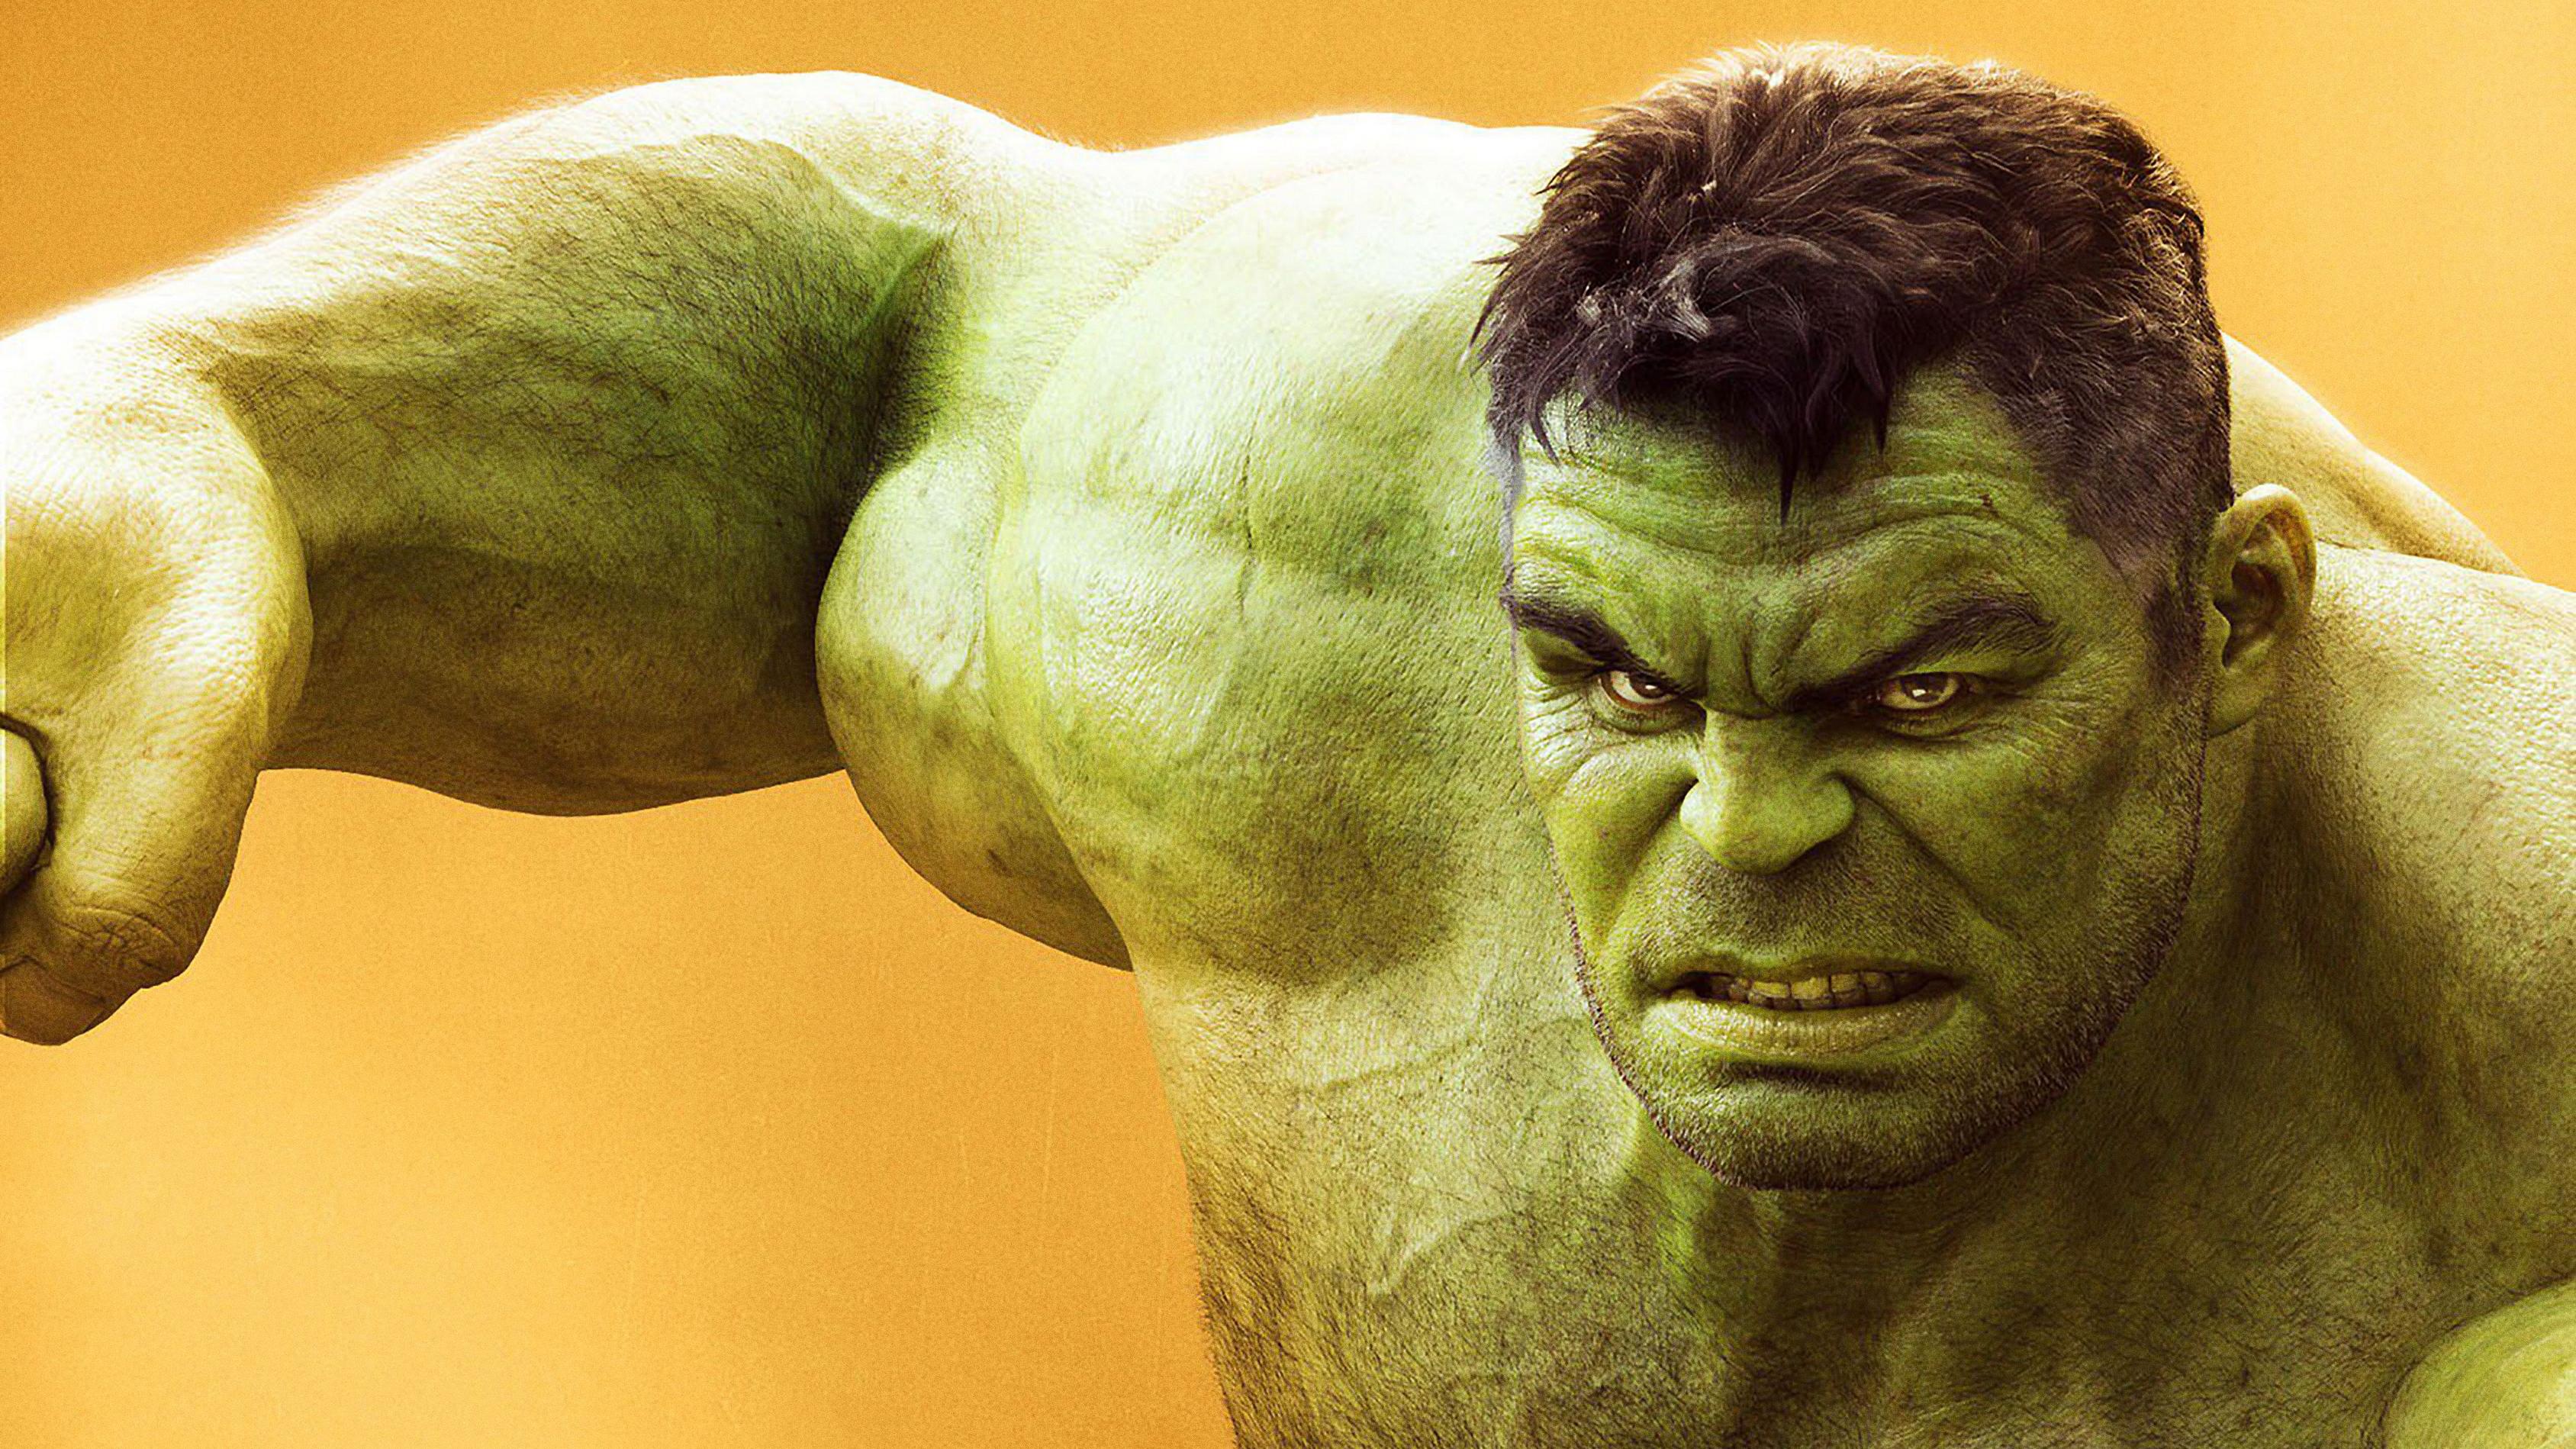 Hulk Superhero, HD Superheroes, 4k Wallpapers, Images ...